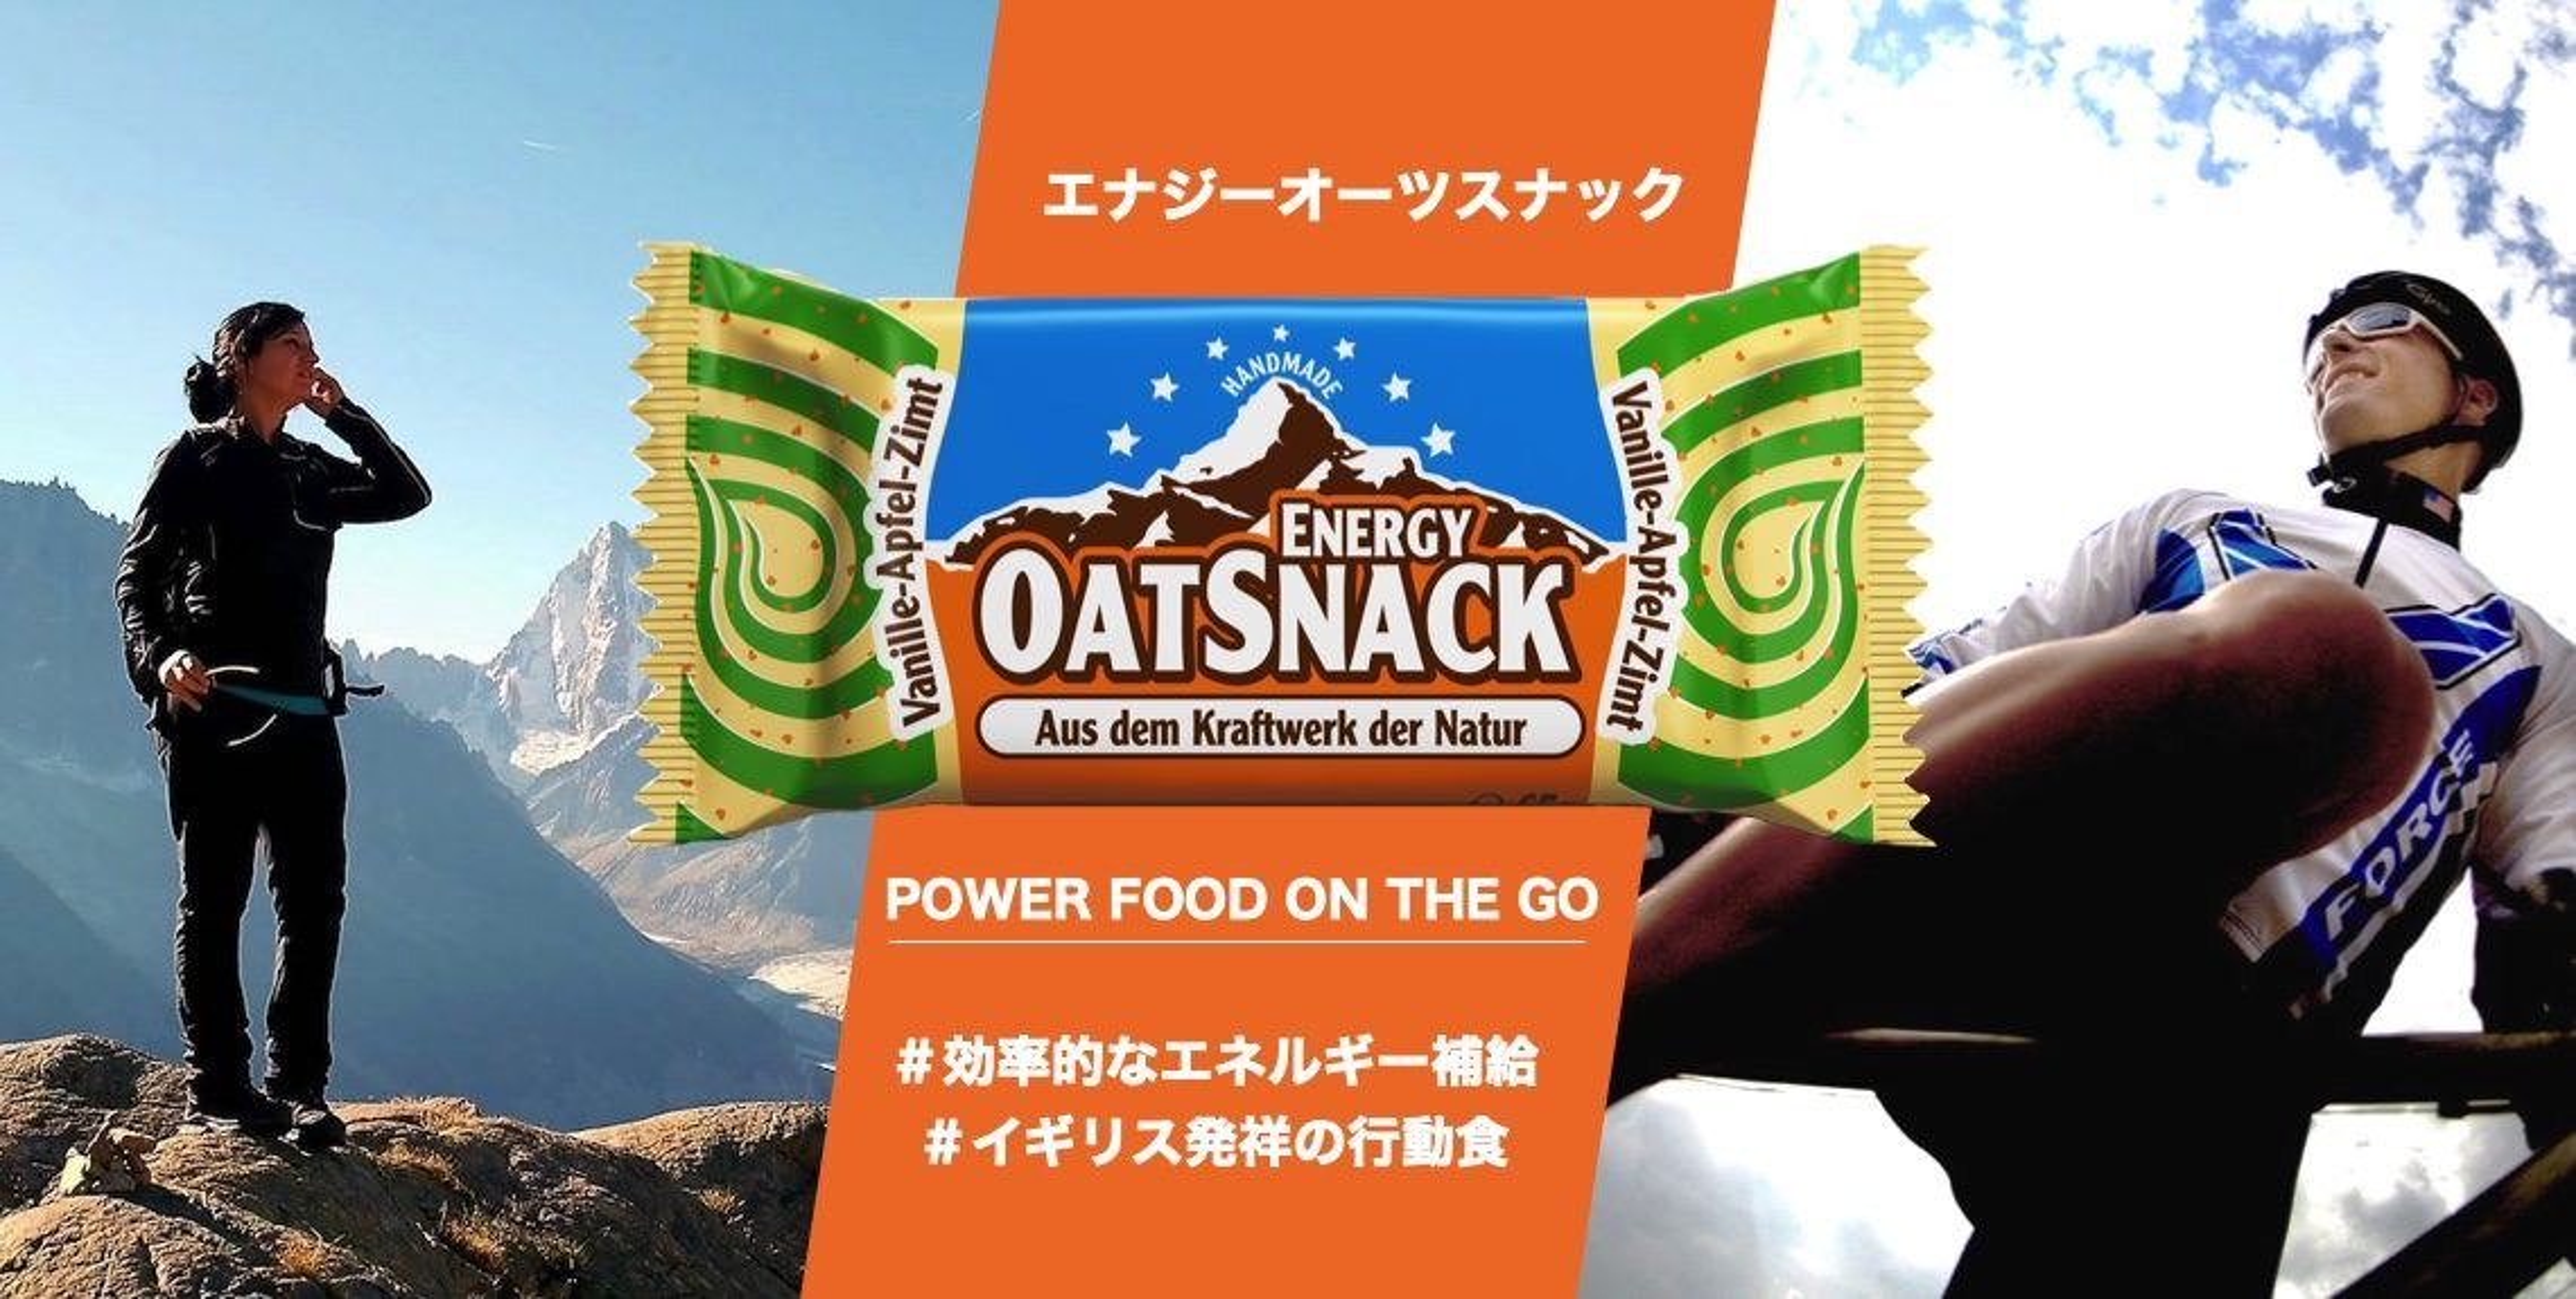 seitenbacher proteinbar mint